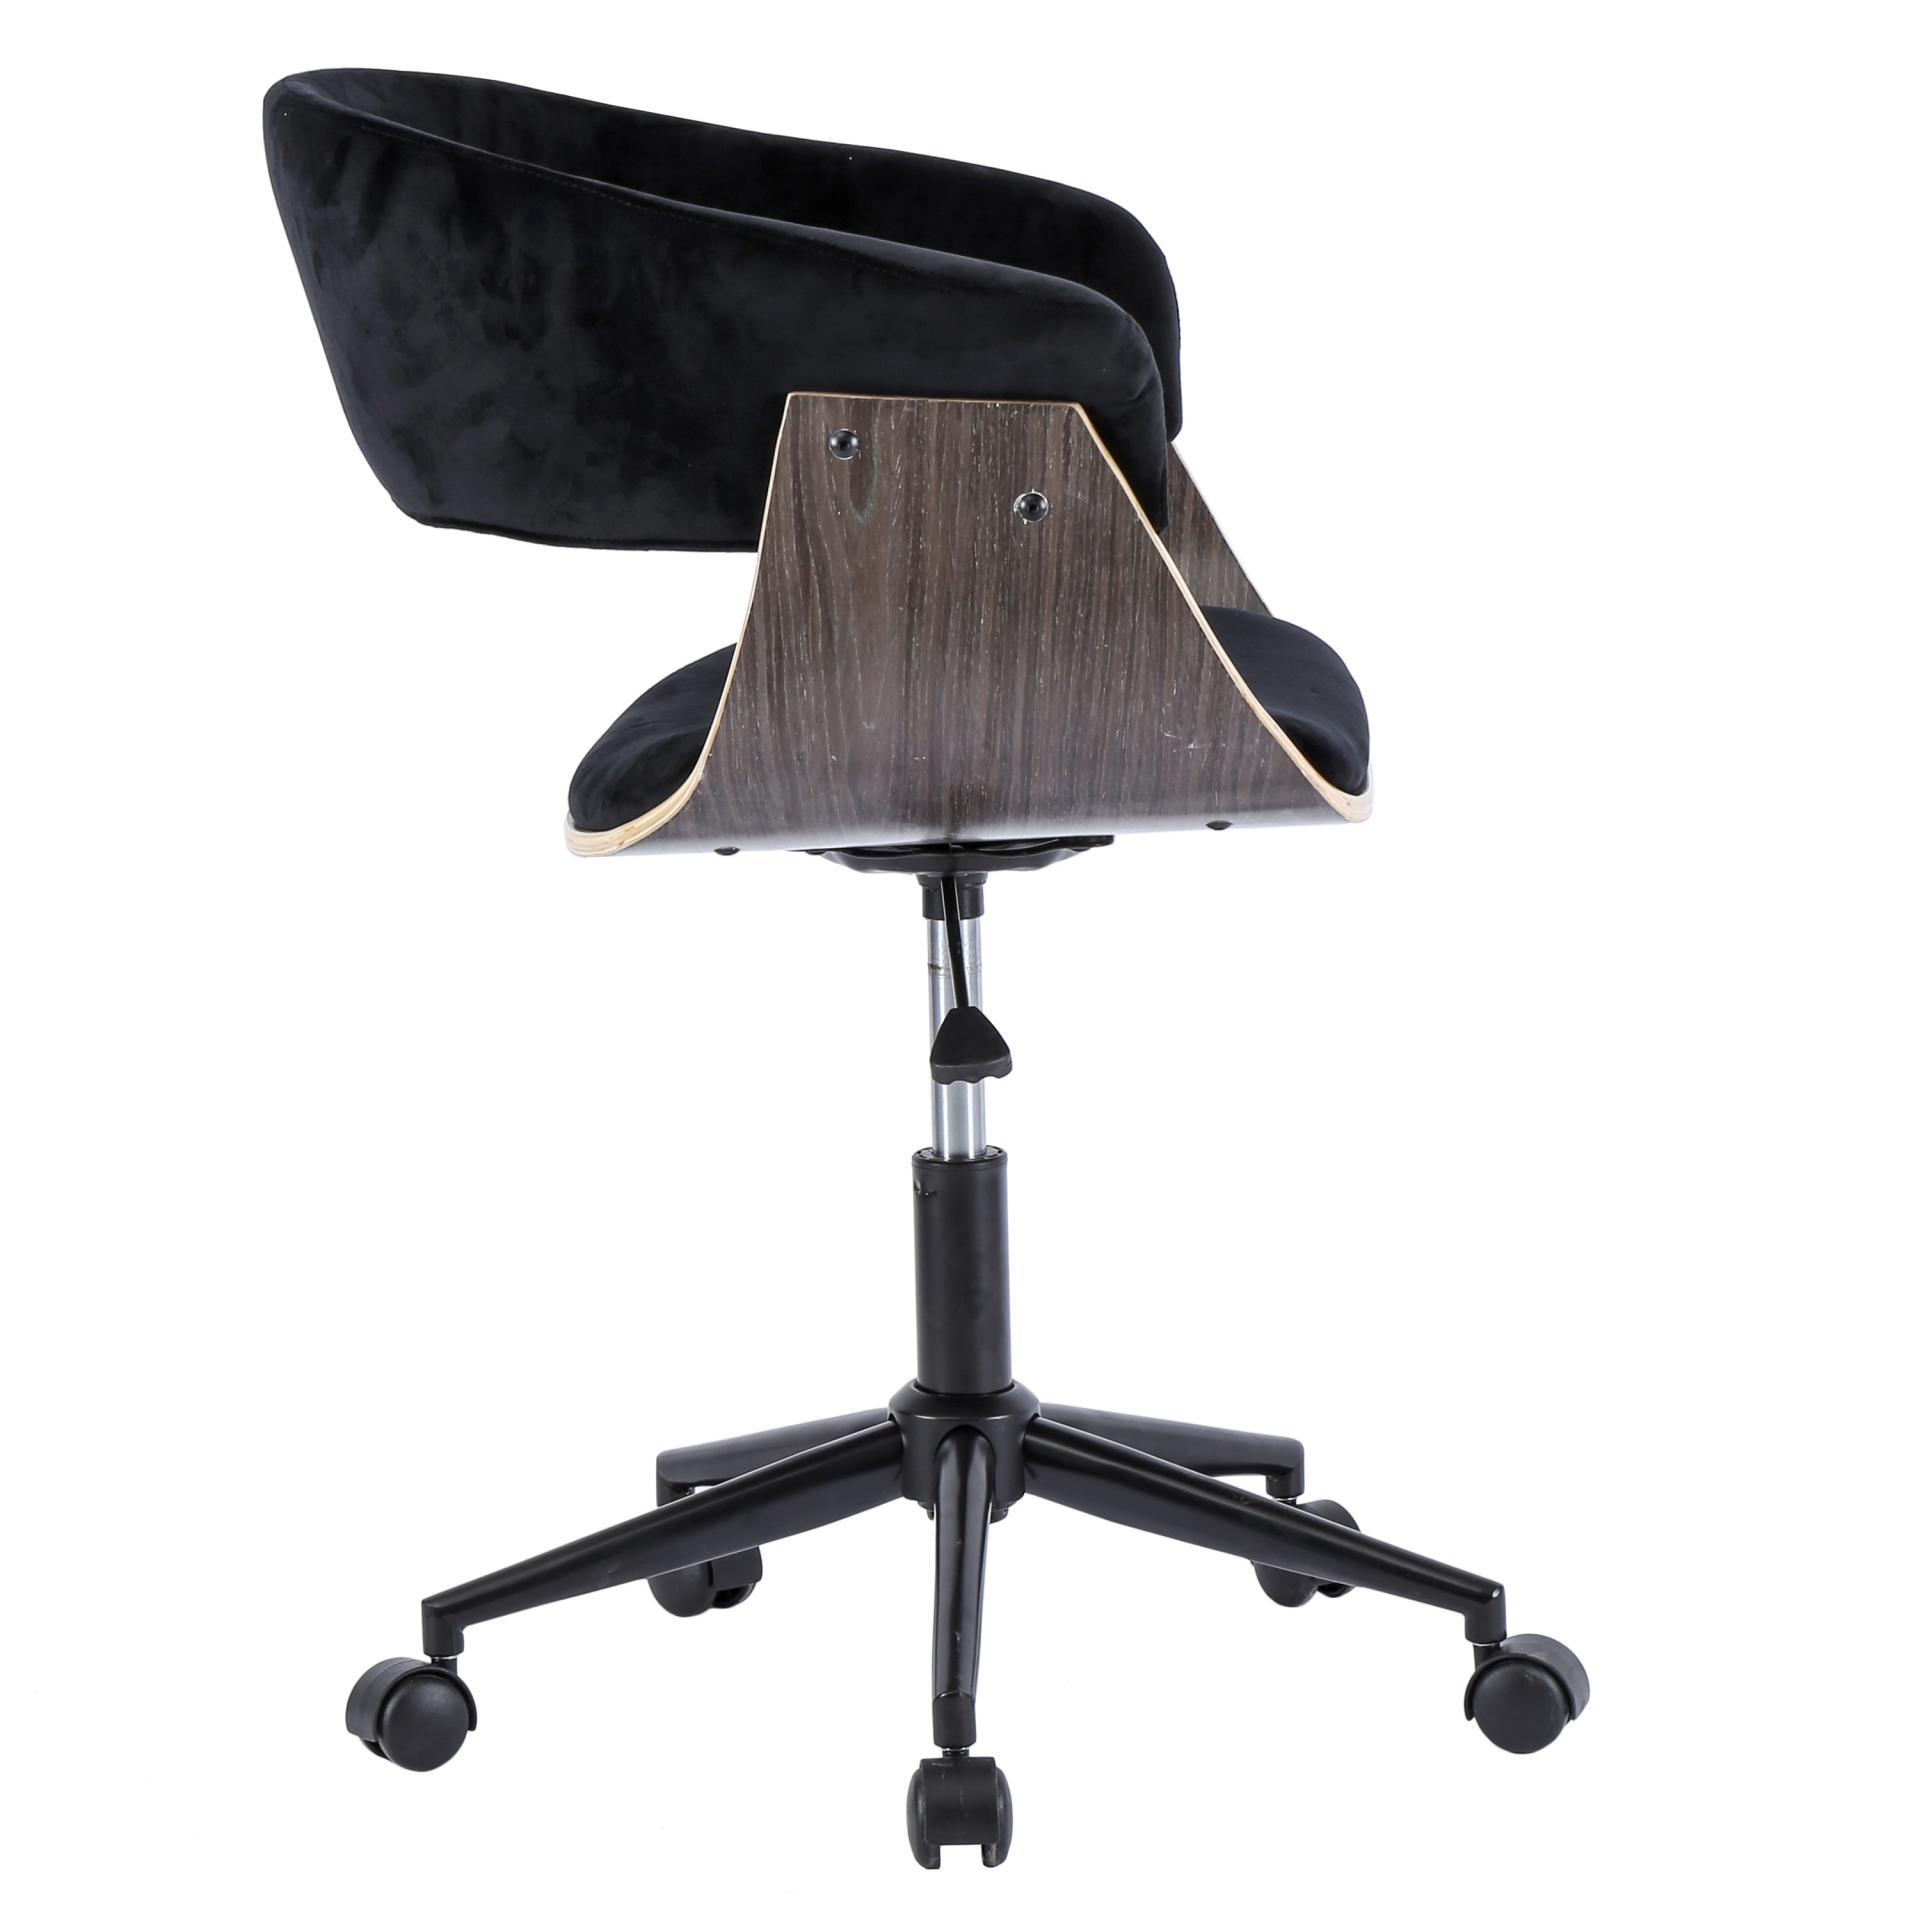 1160024 Vbb Npd Home Furniture Wholesale Lifestyle Furnishings